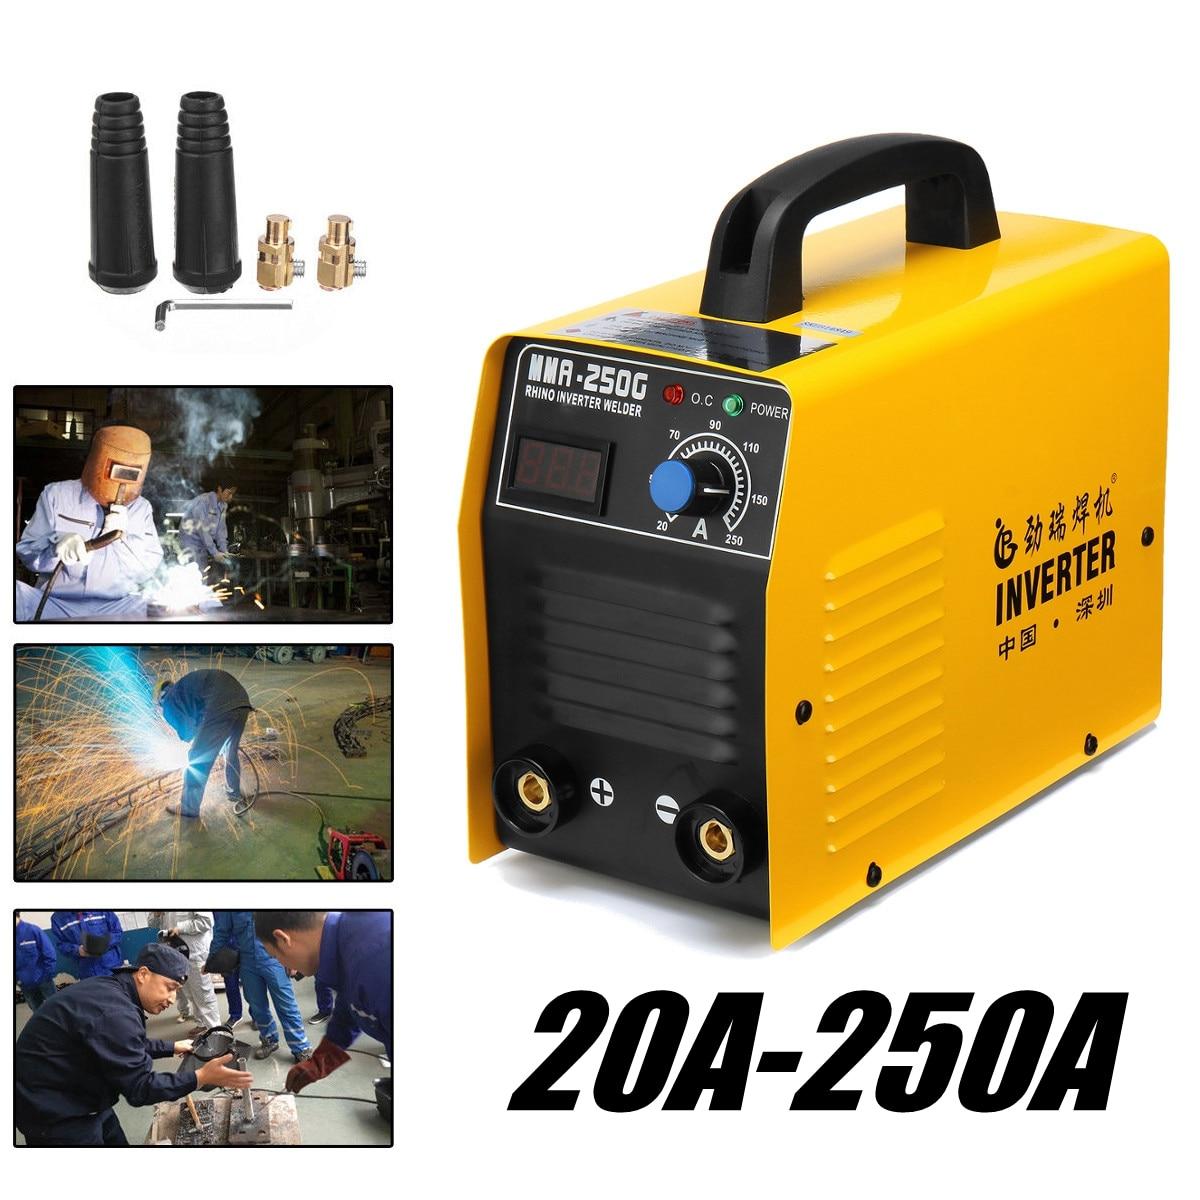 20-250A 25KVA IP21 Inverter Arc Electric Welding Machine IGBT/MMA/ARC/ZX7 Welder For Welding Electric Working Digital Display